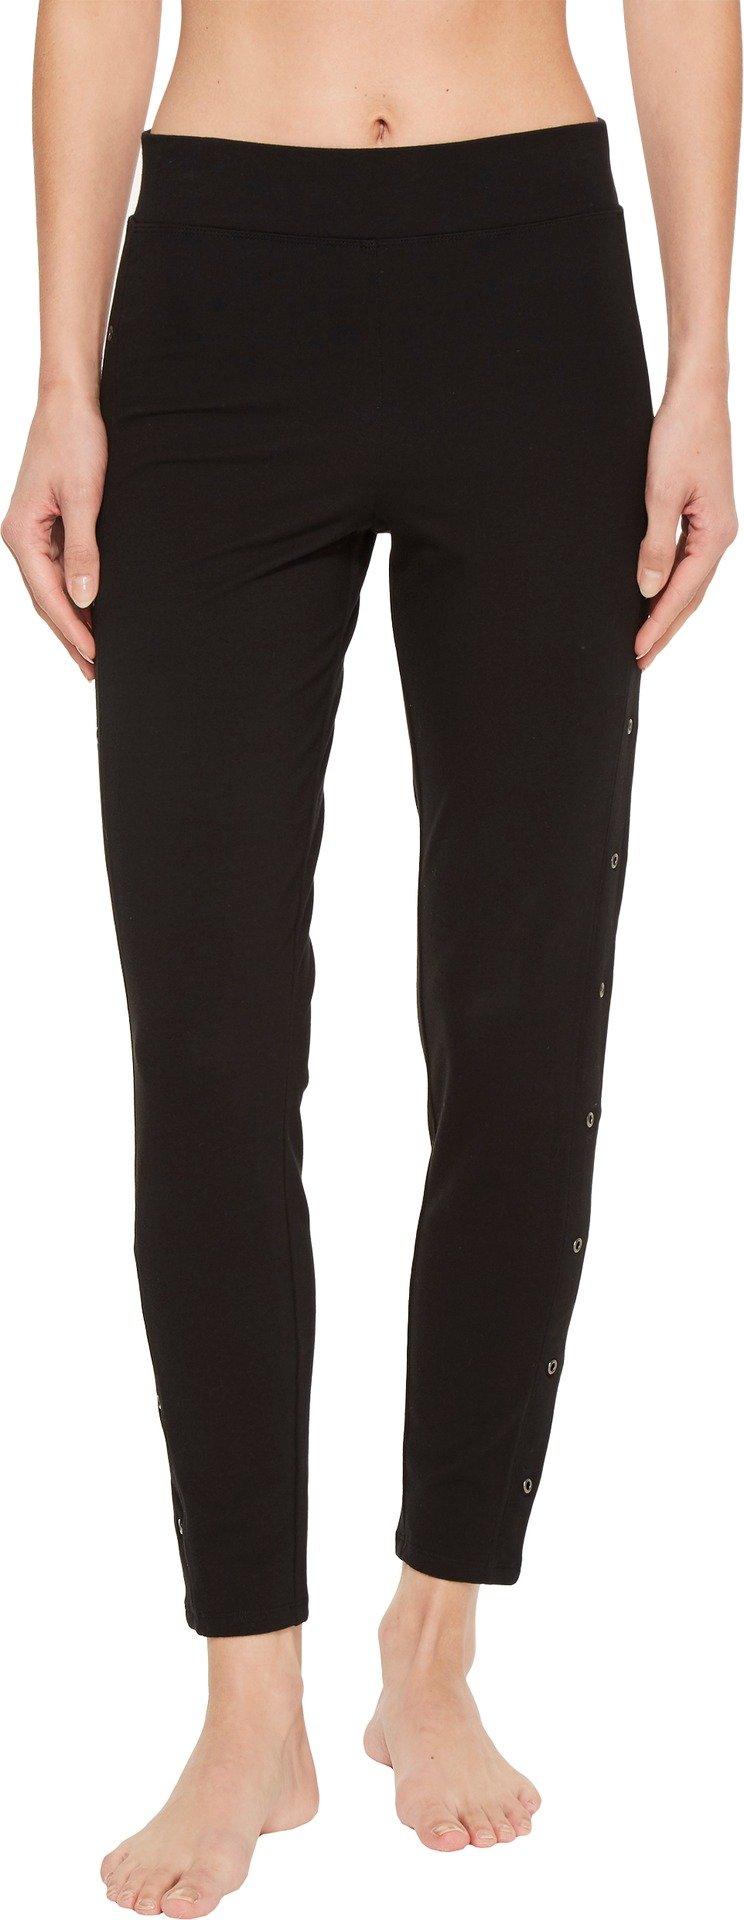 Yummie Women's Compact Cotton Ankle Legging With Grommets Sockshosiery, black, M